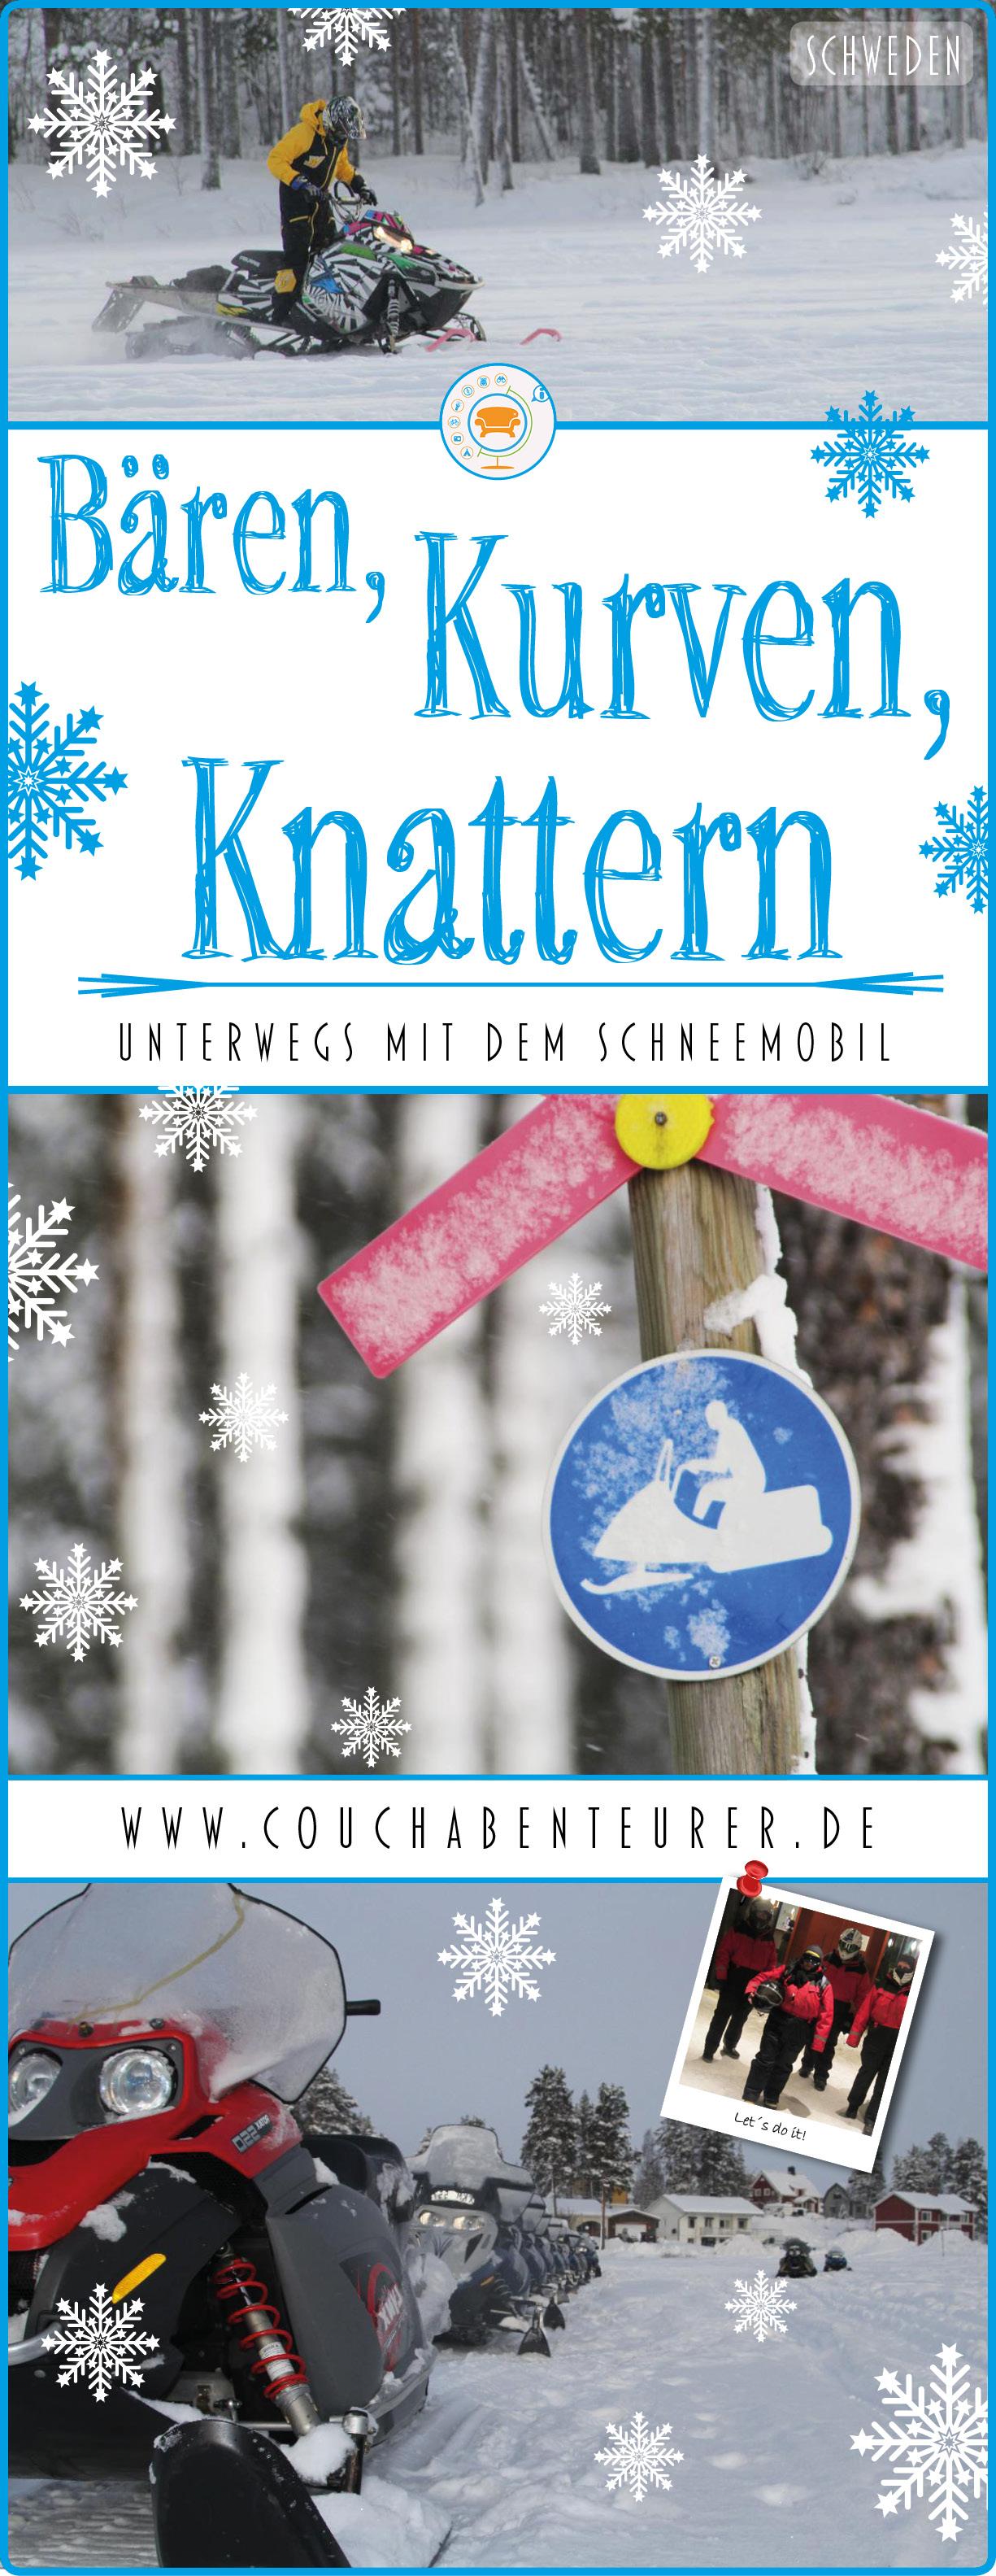 Bären-Kurven-Knattern-unterwegs-Schneemobil-Schweden